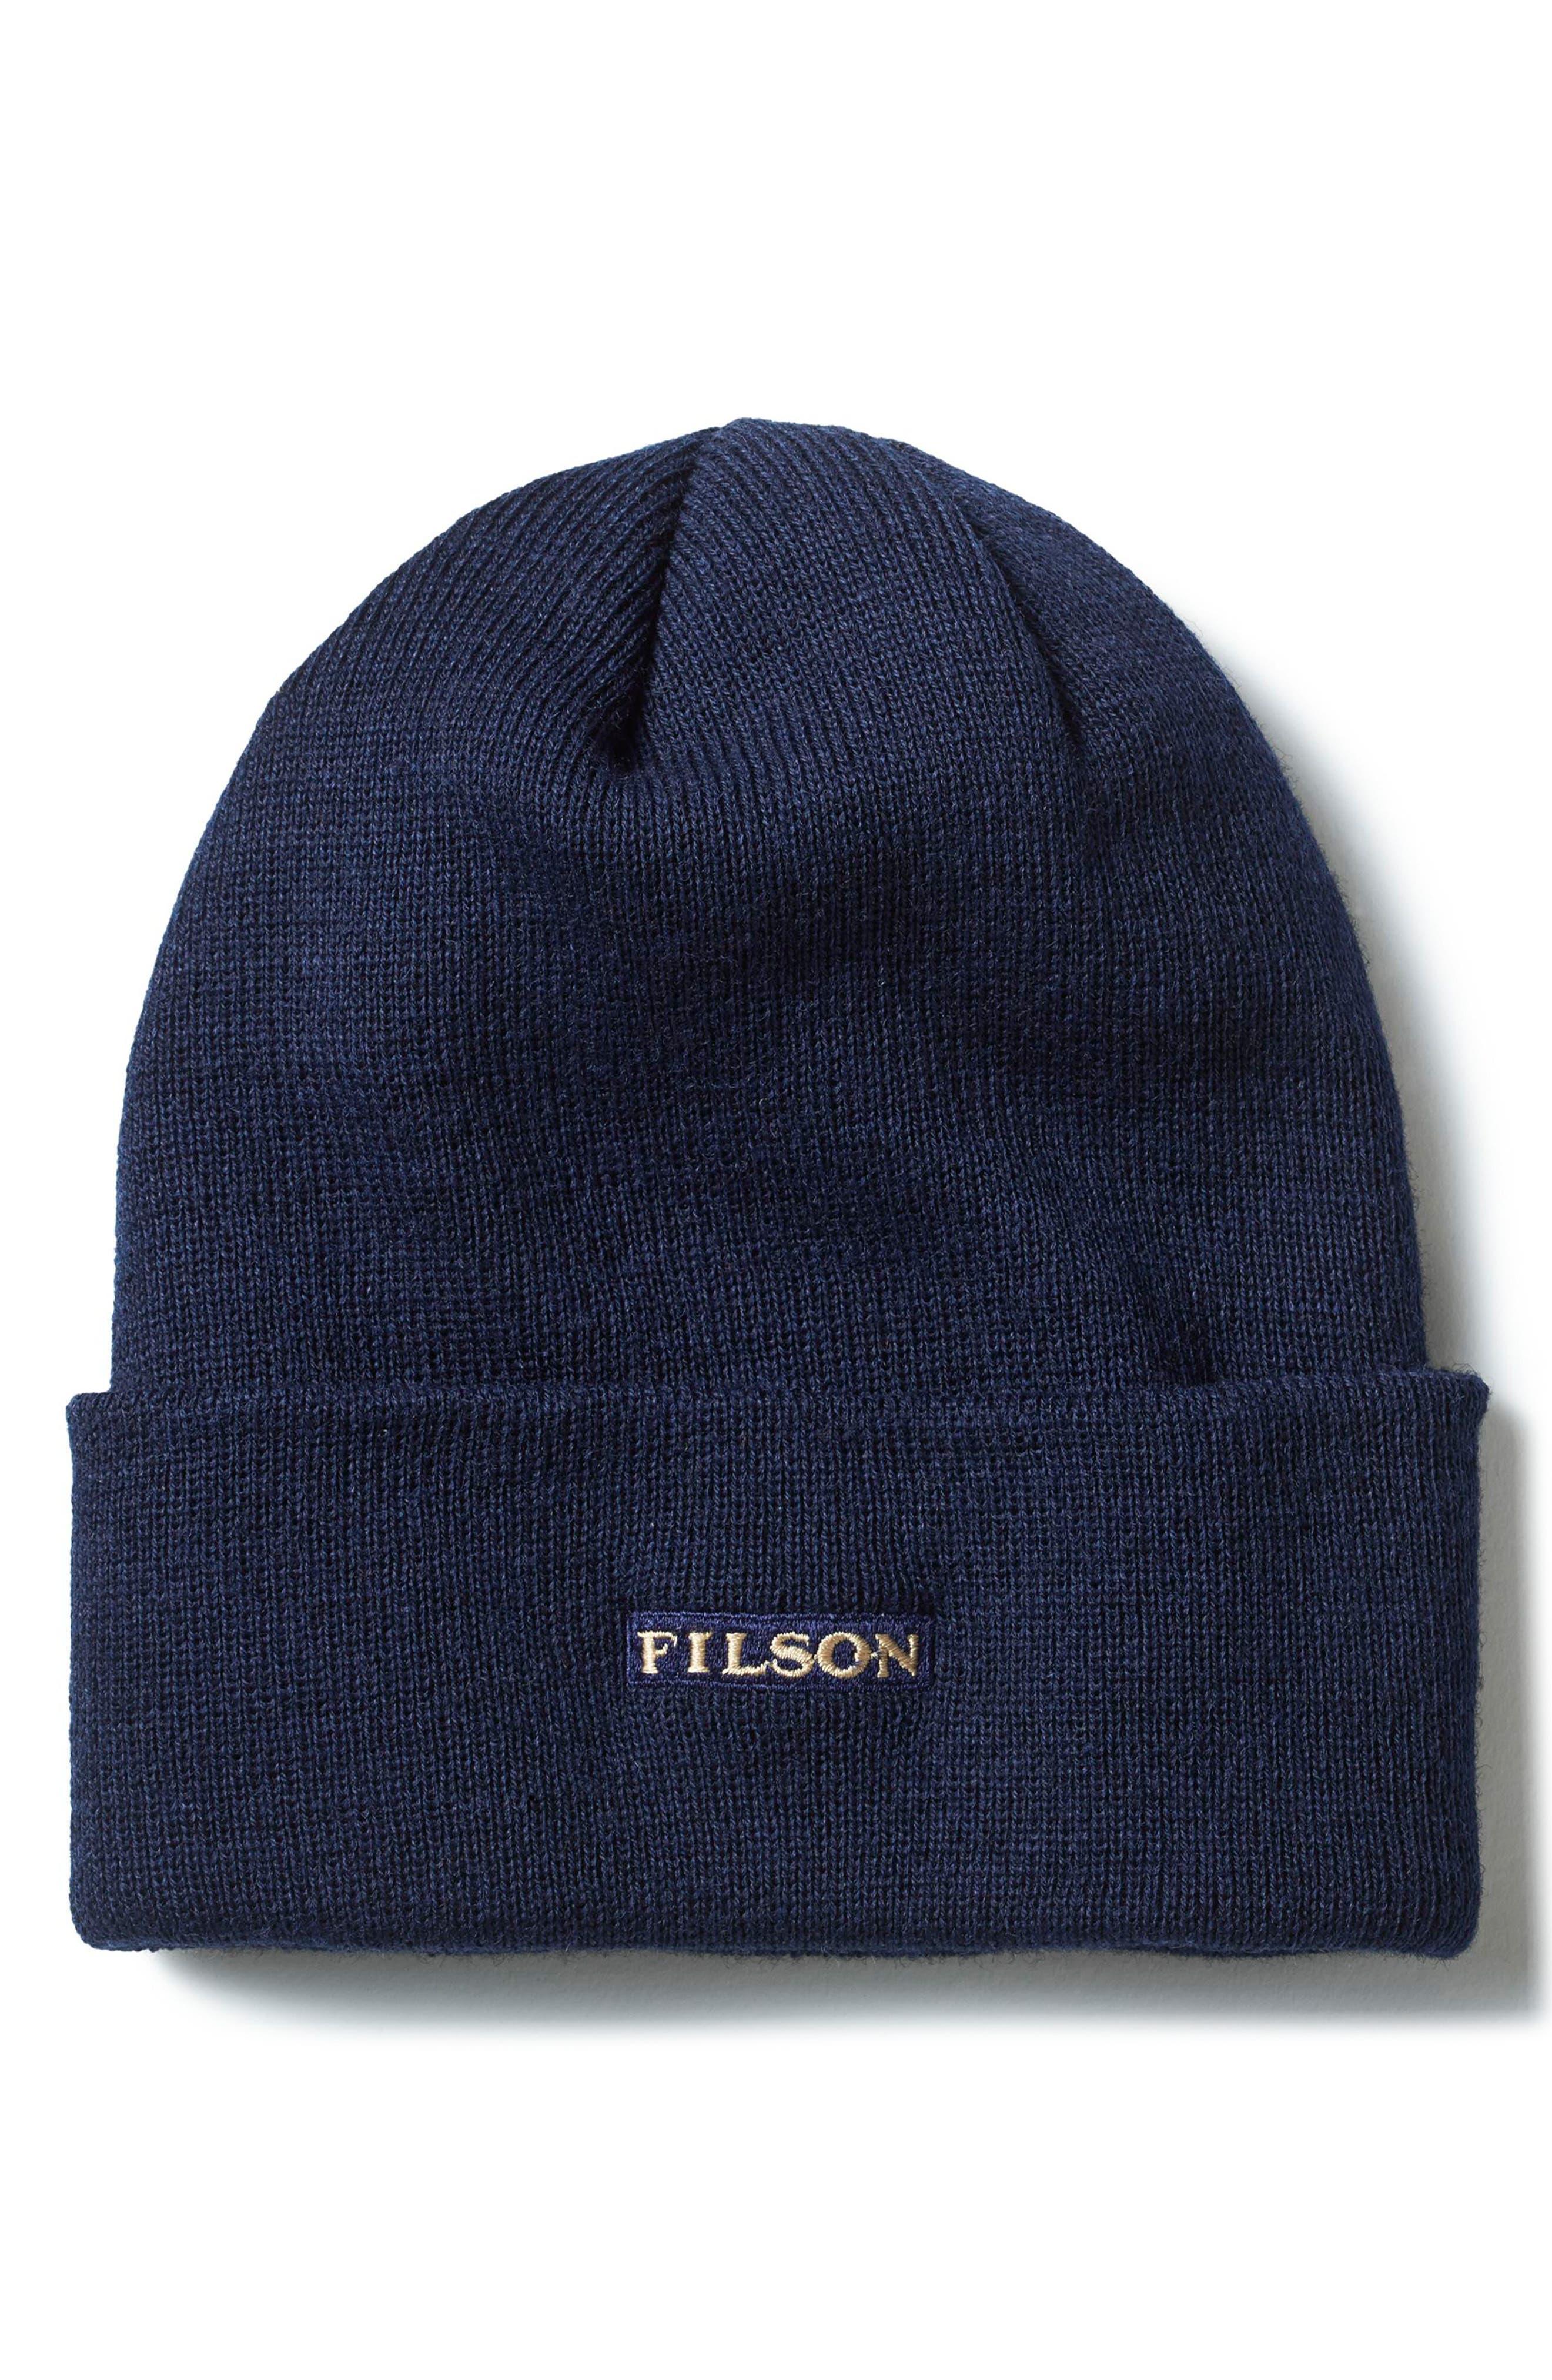 WOOL CAP - BLUE